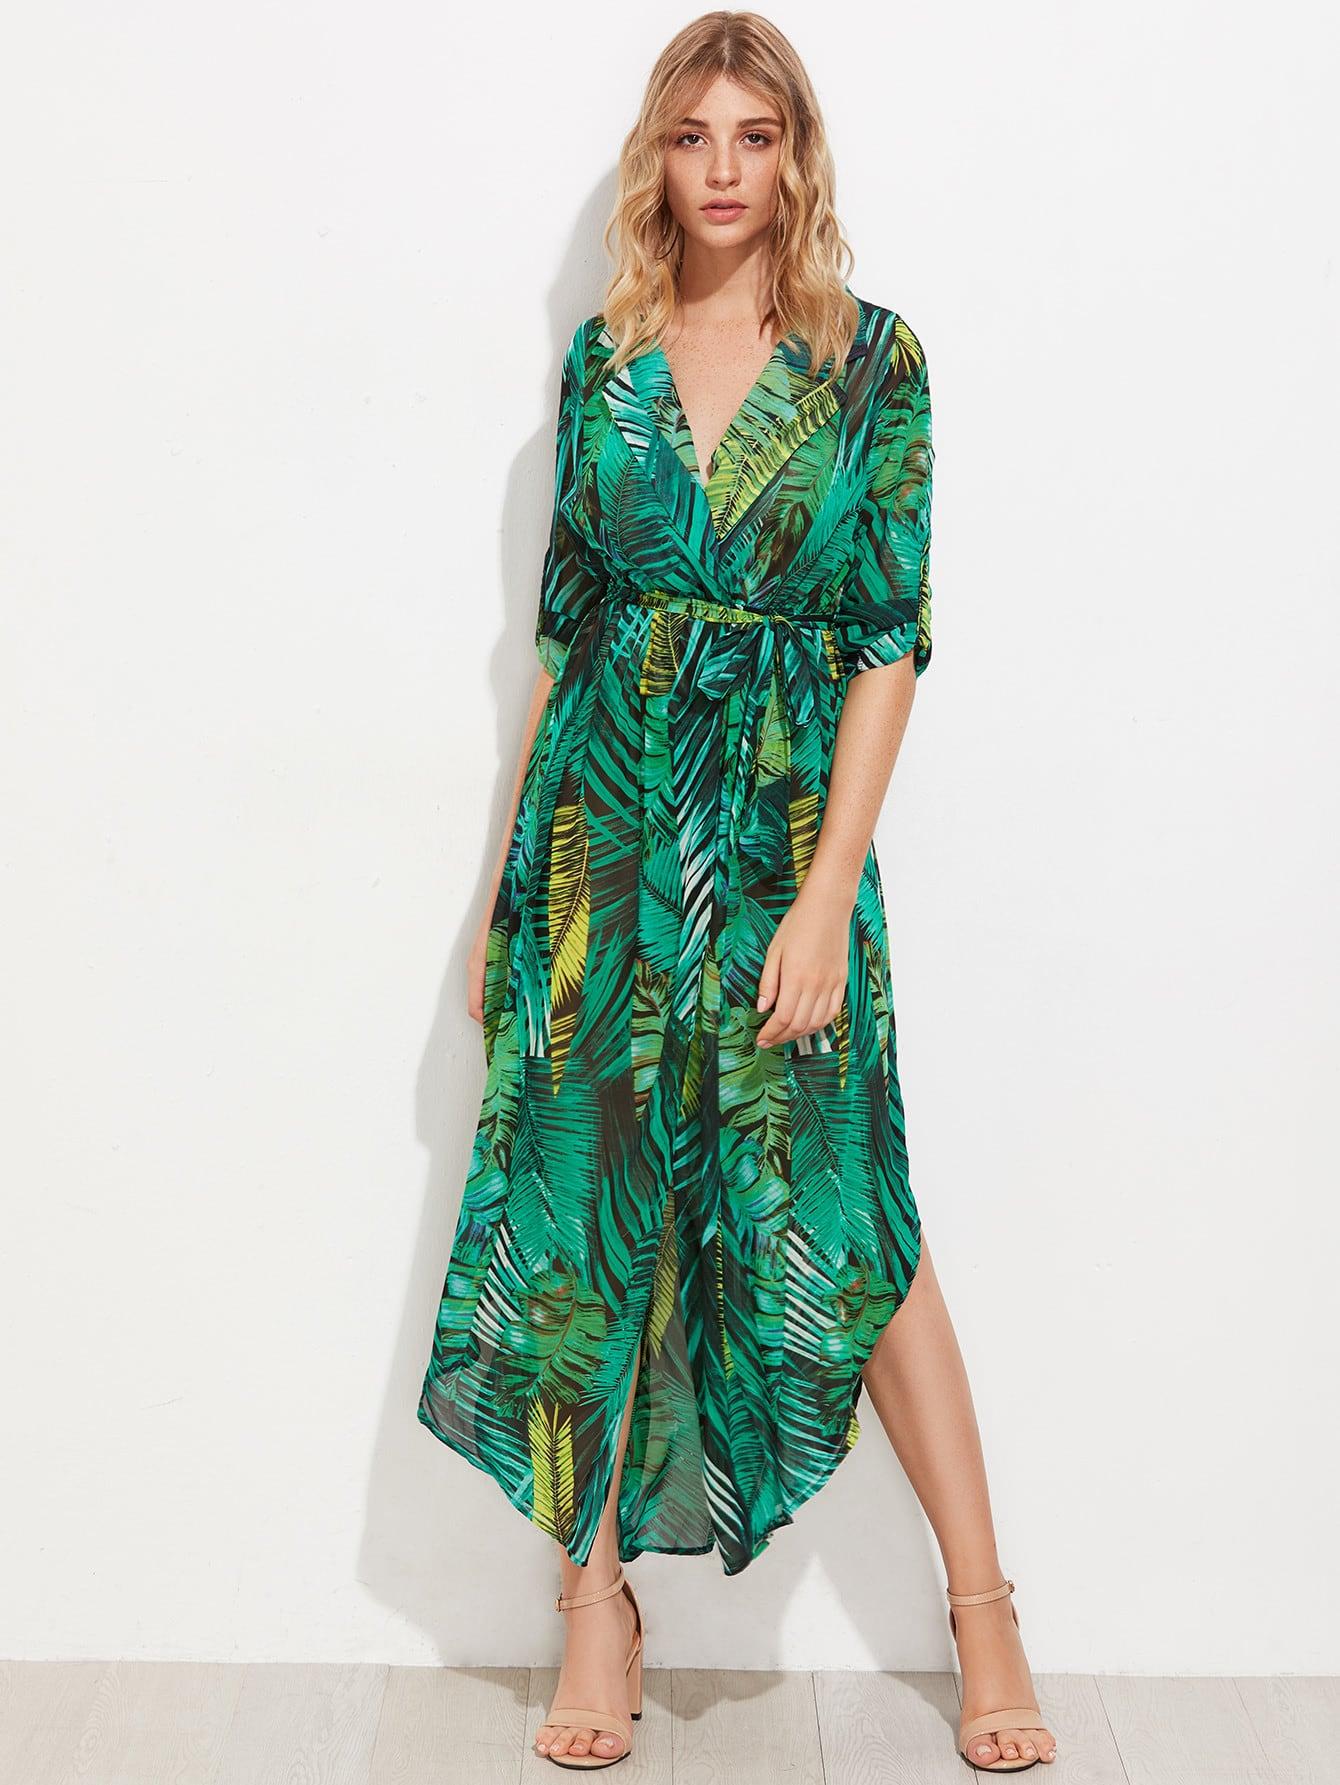 Allover Palm Leaf Print Curved Hem Shirt Dress allover bear print dress